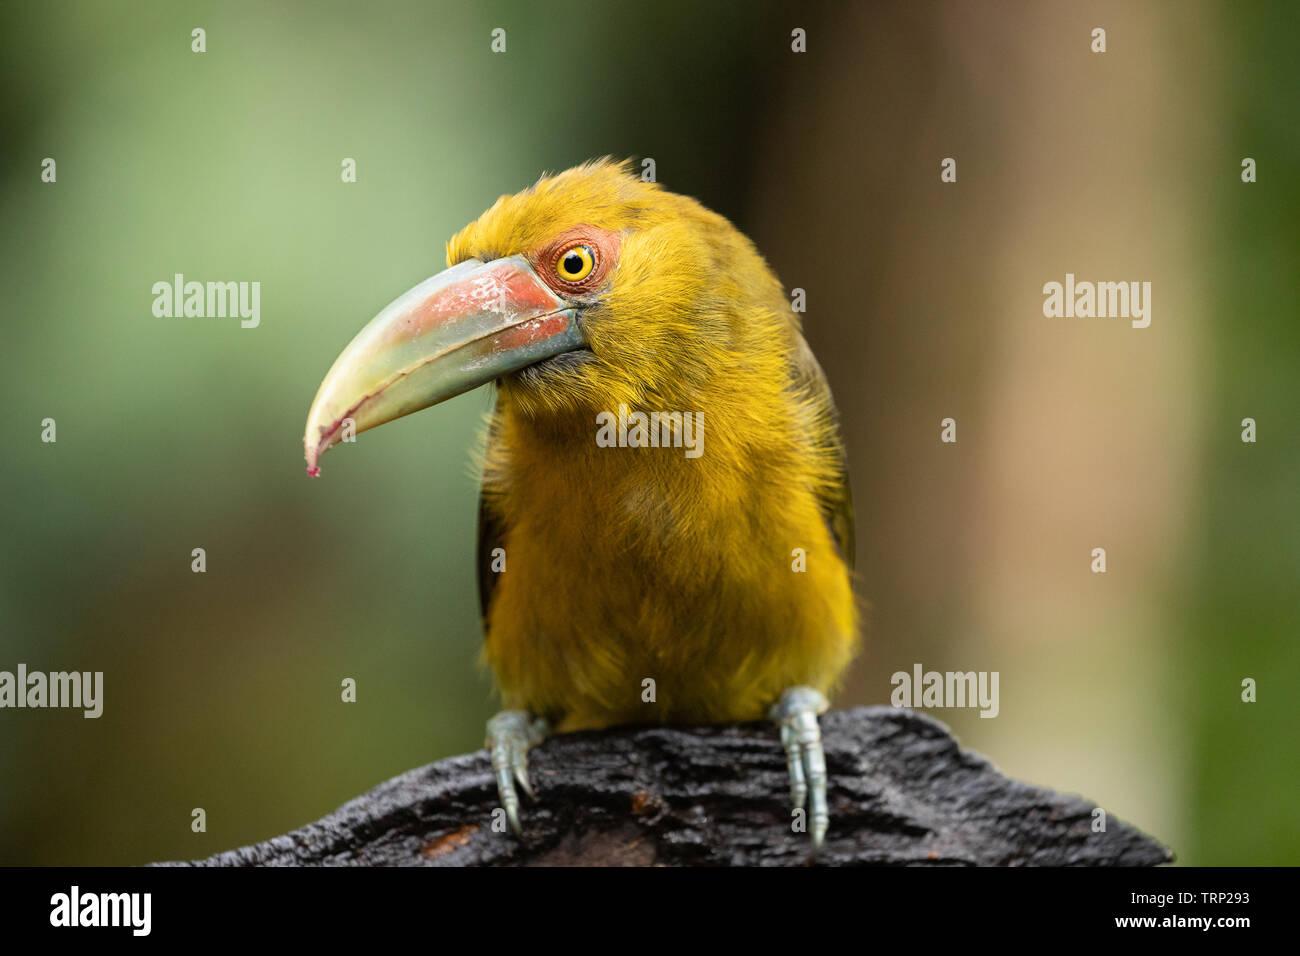 araçari-banana - Stock Image